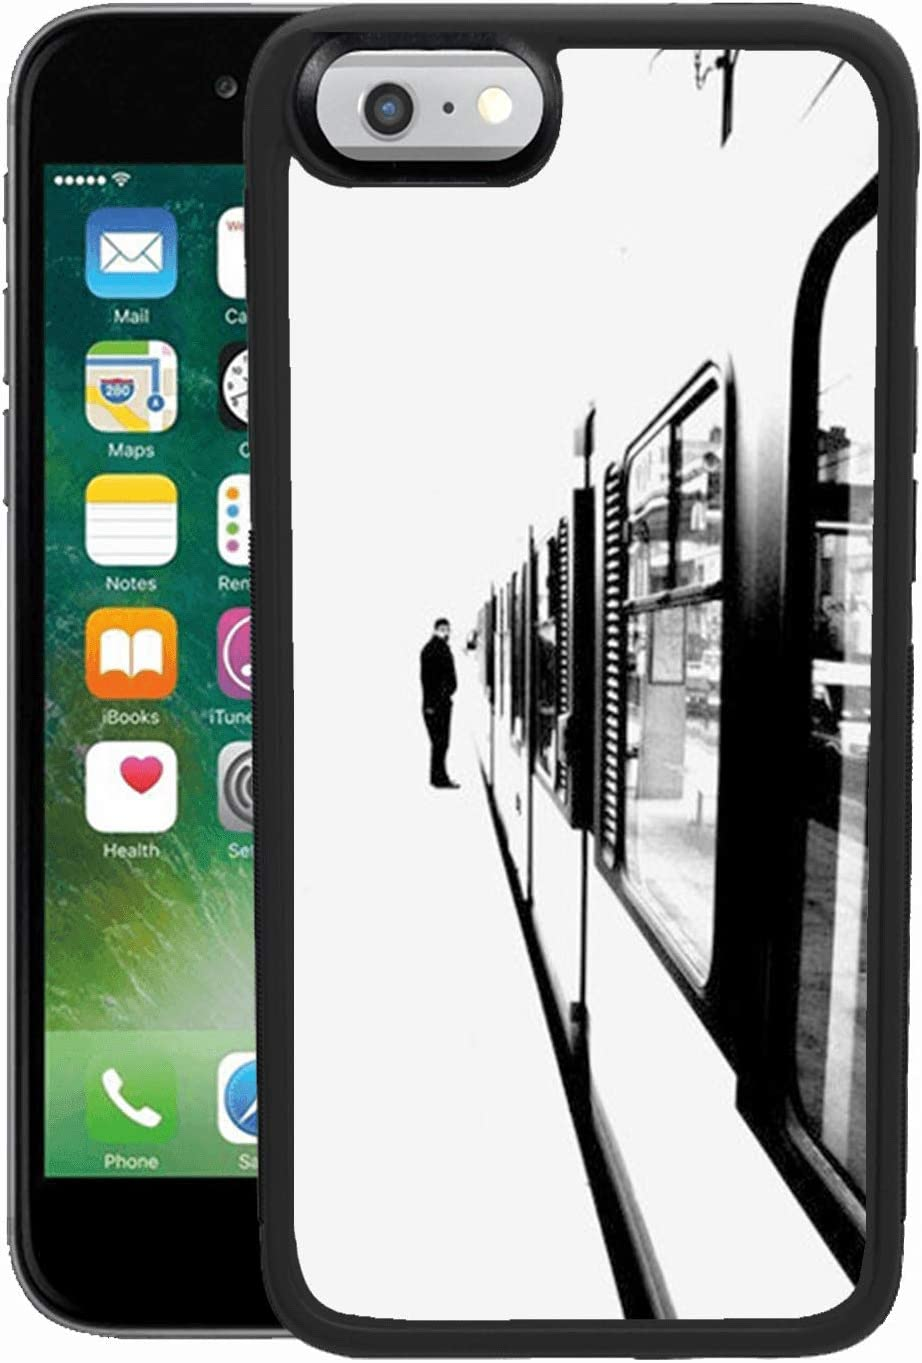 Amazon Com Metro Passenger Iphone 6s 6 Phone Case Shockproof Soft Tpu Premium Pc Protective Customized Design Bumper For Iphone 6s 6 Black